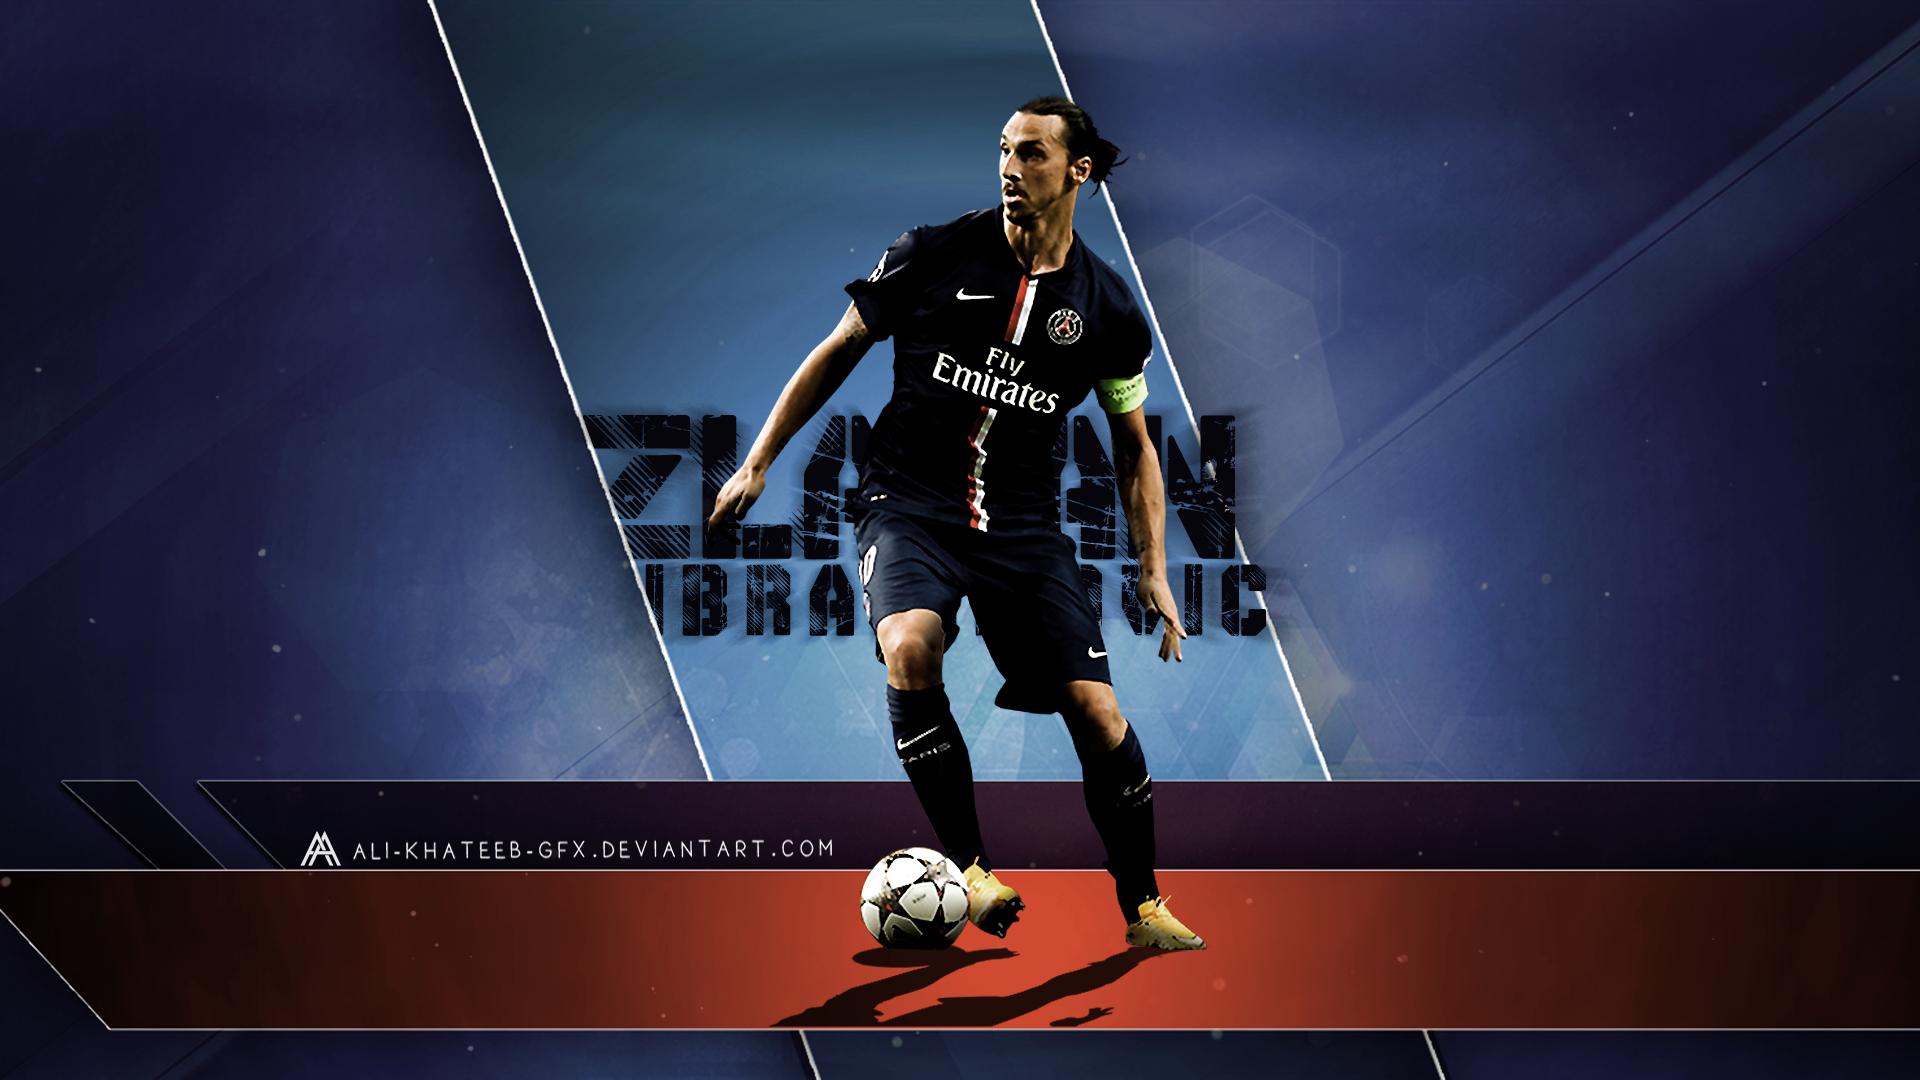 Zlatan Ibrahimovic PSG HD Wallpaper By Ali Khateeb Gfx